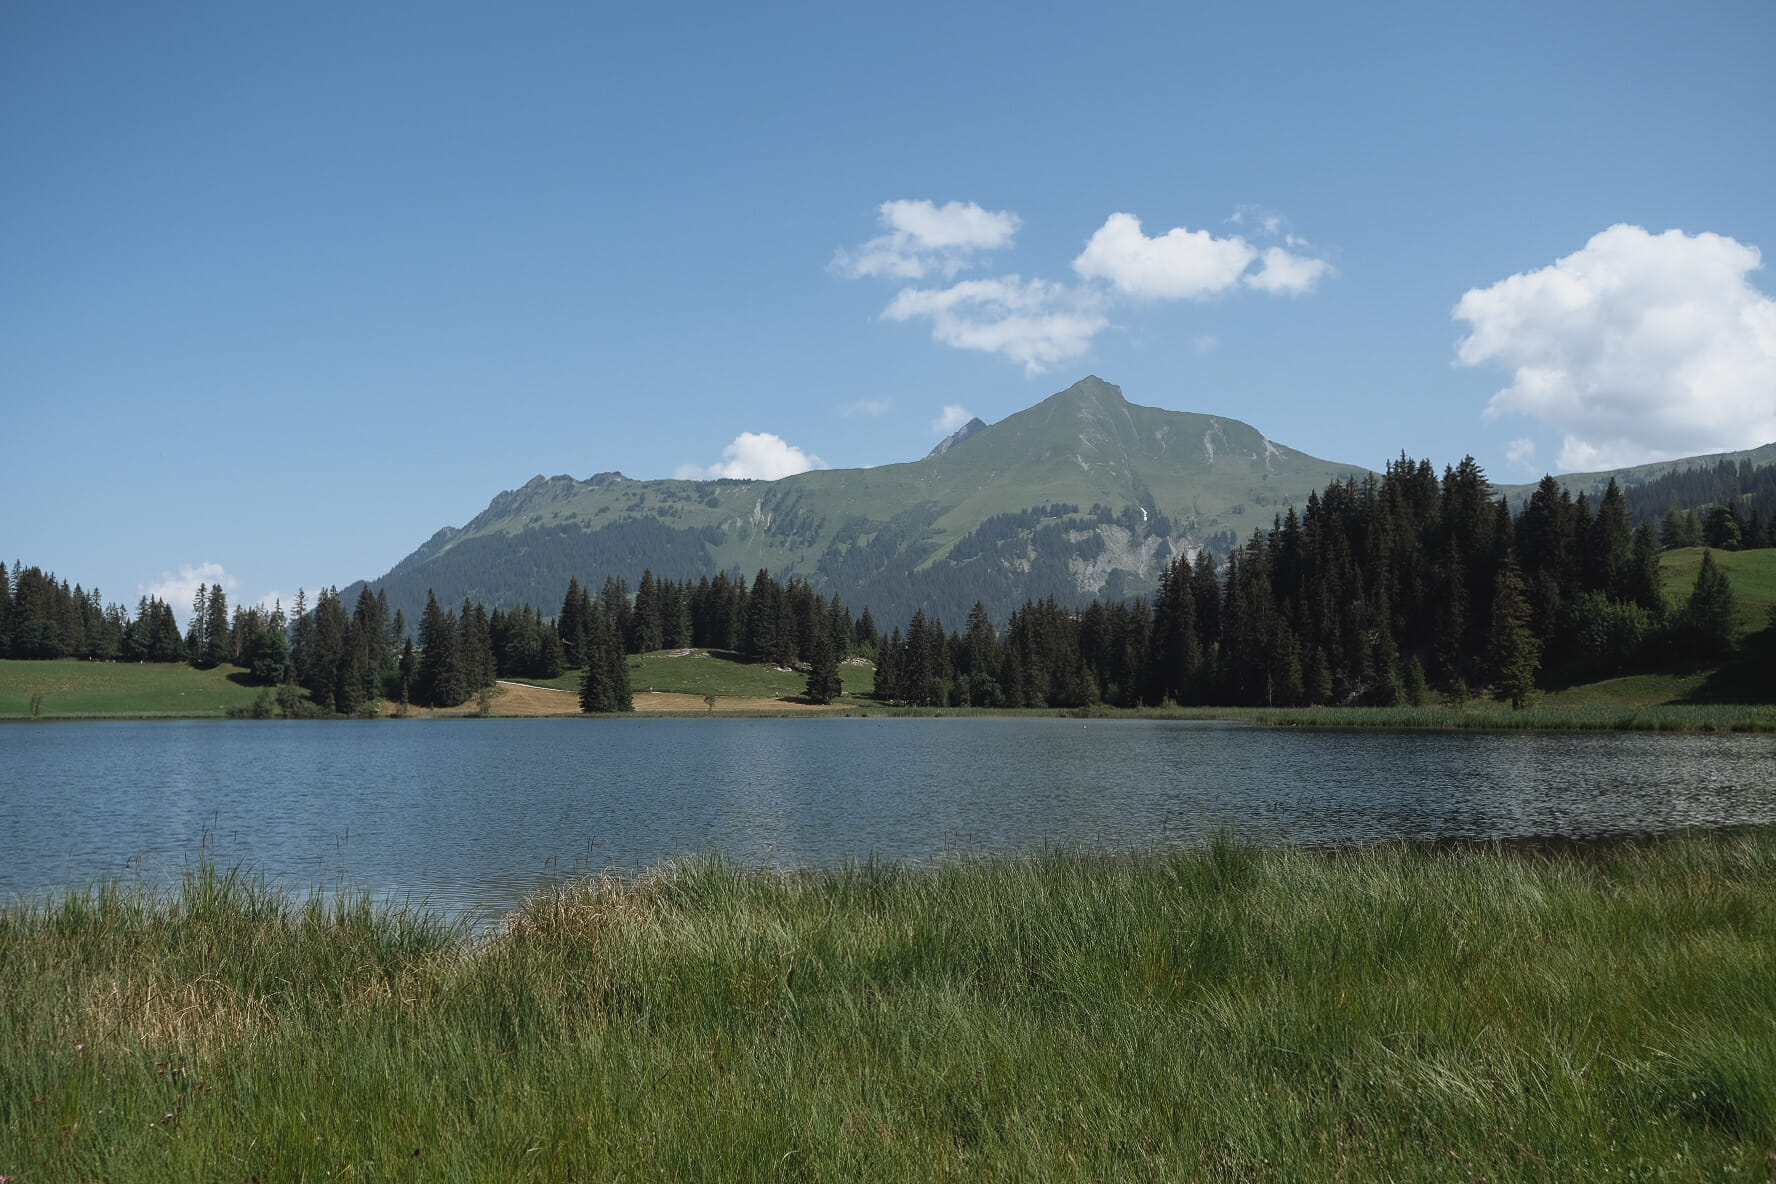 lac-de-lauenen-dans-la-region-de-gstaad